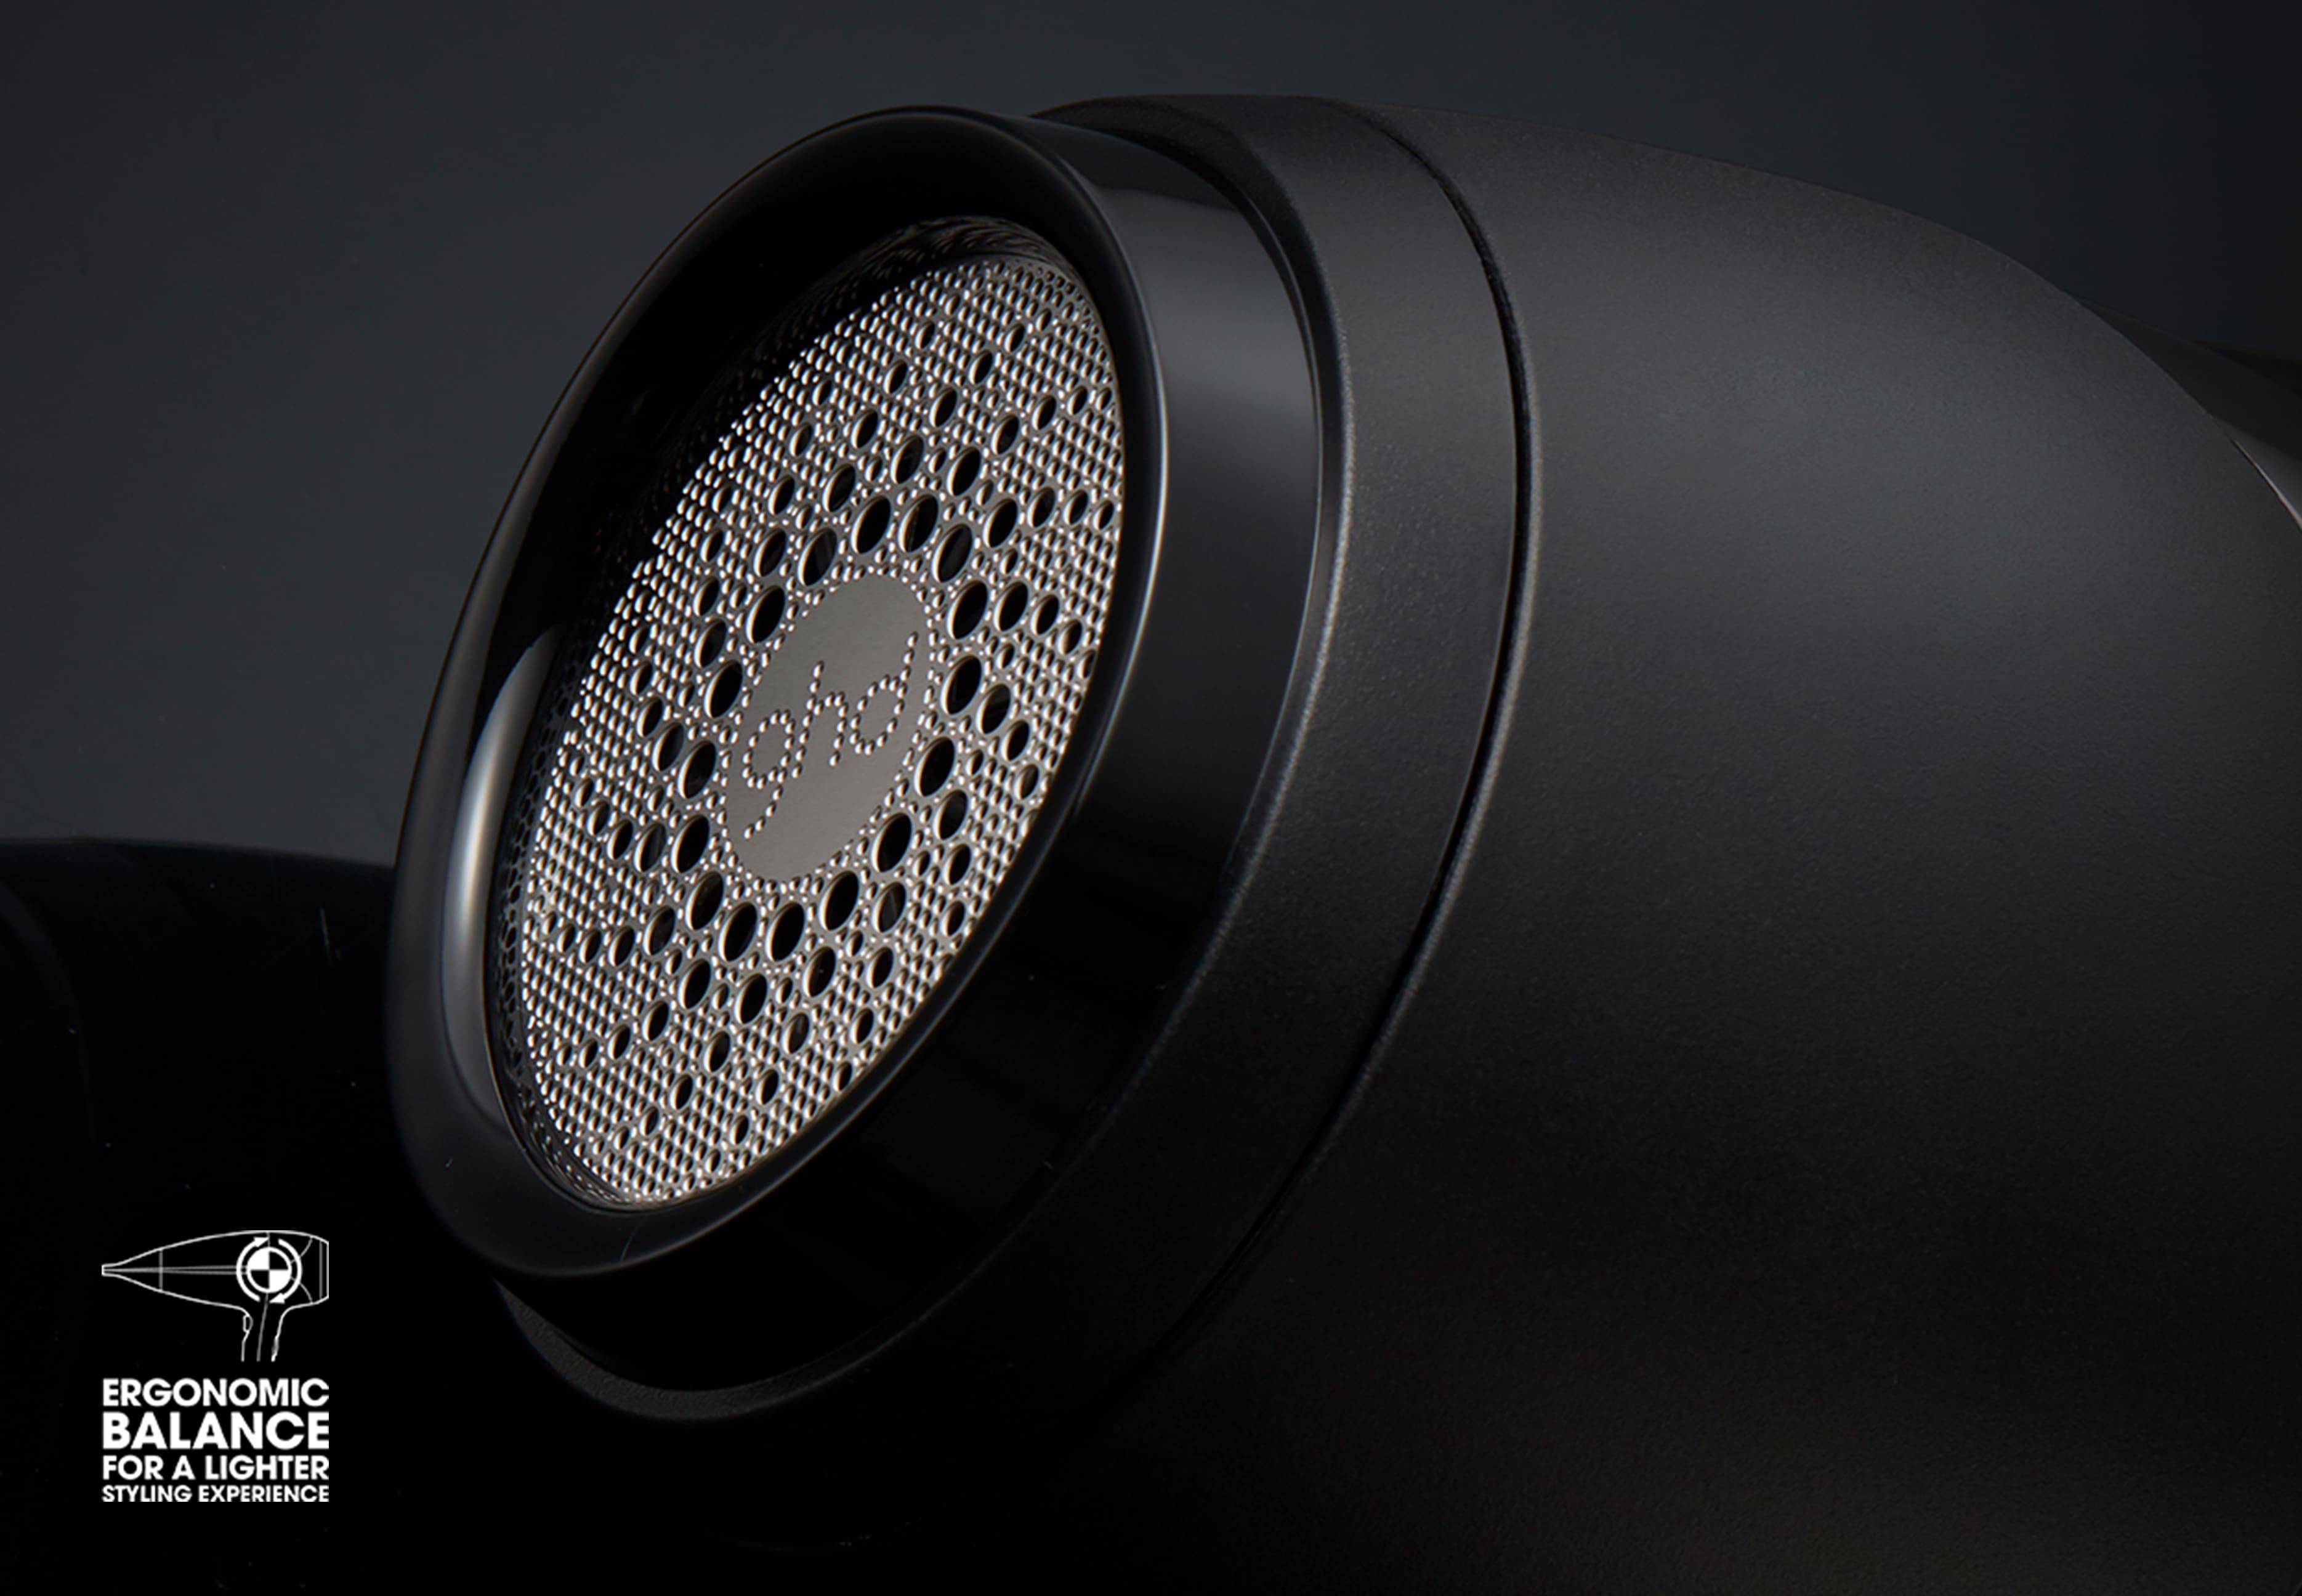 ghd air professional hair dryer filter close-up